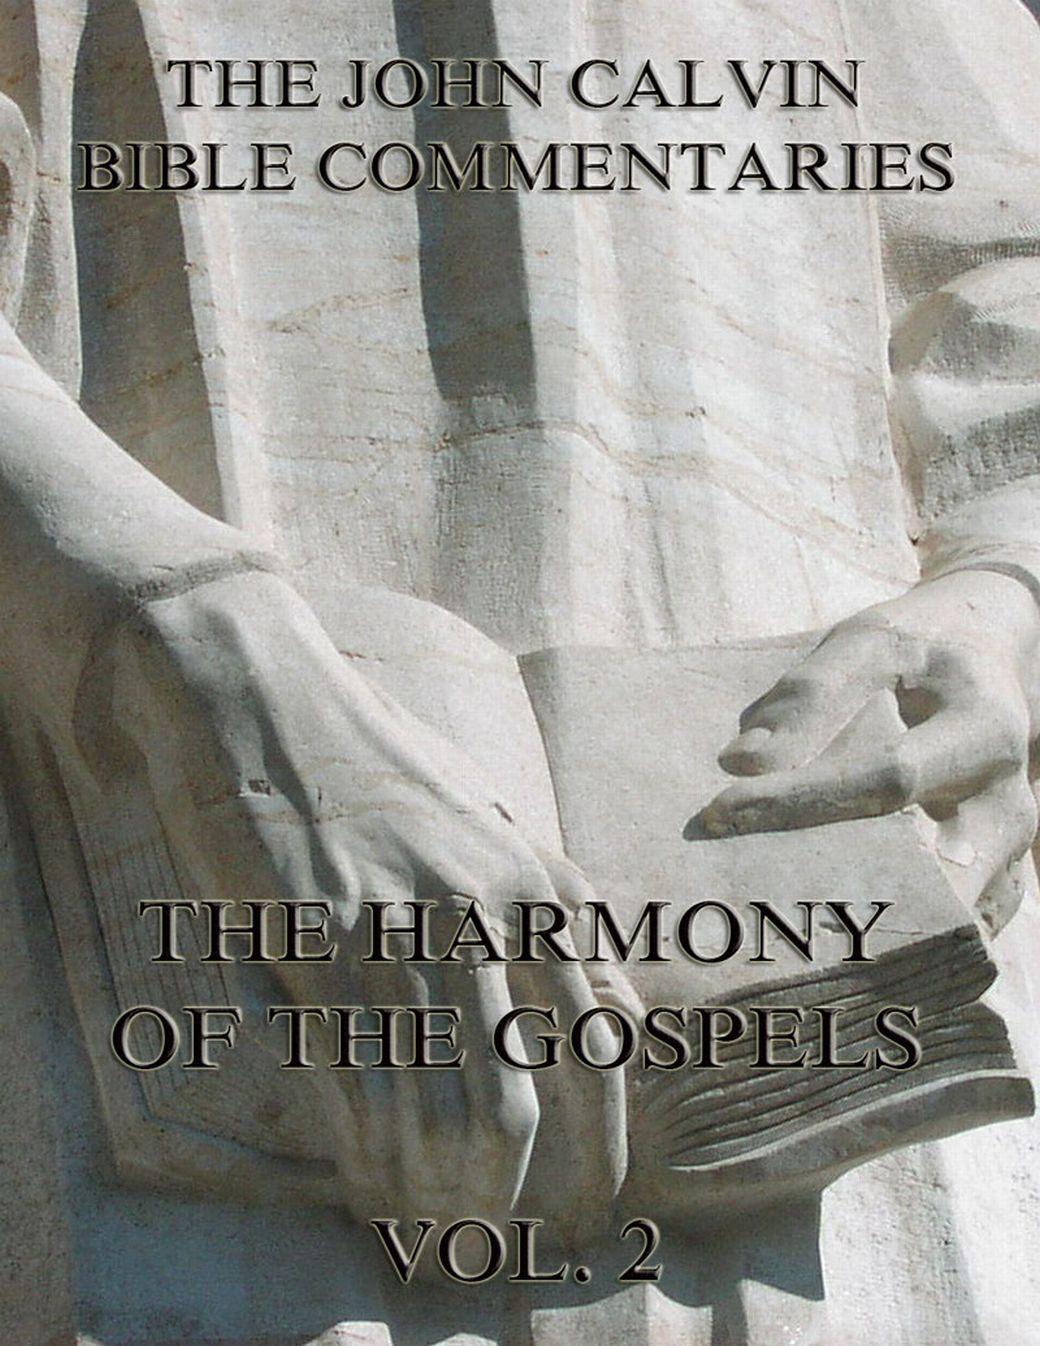 John Calvin John Calvin's Commentaries On The Harmony Of The Gospels Vol. 2 ruskin john on the old road vol 2 of 2